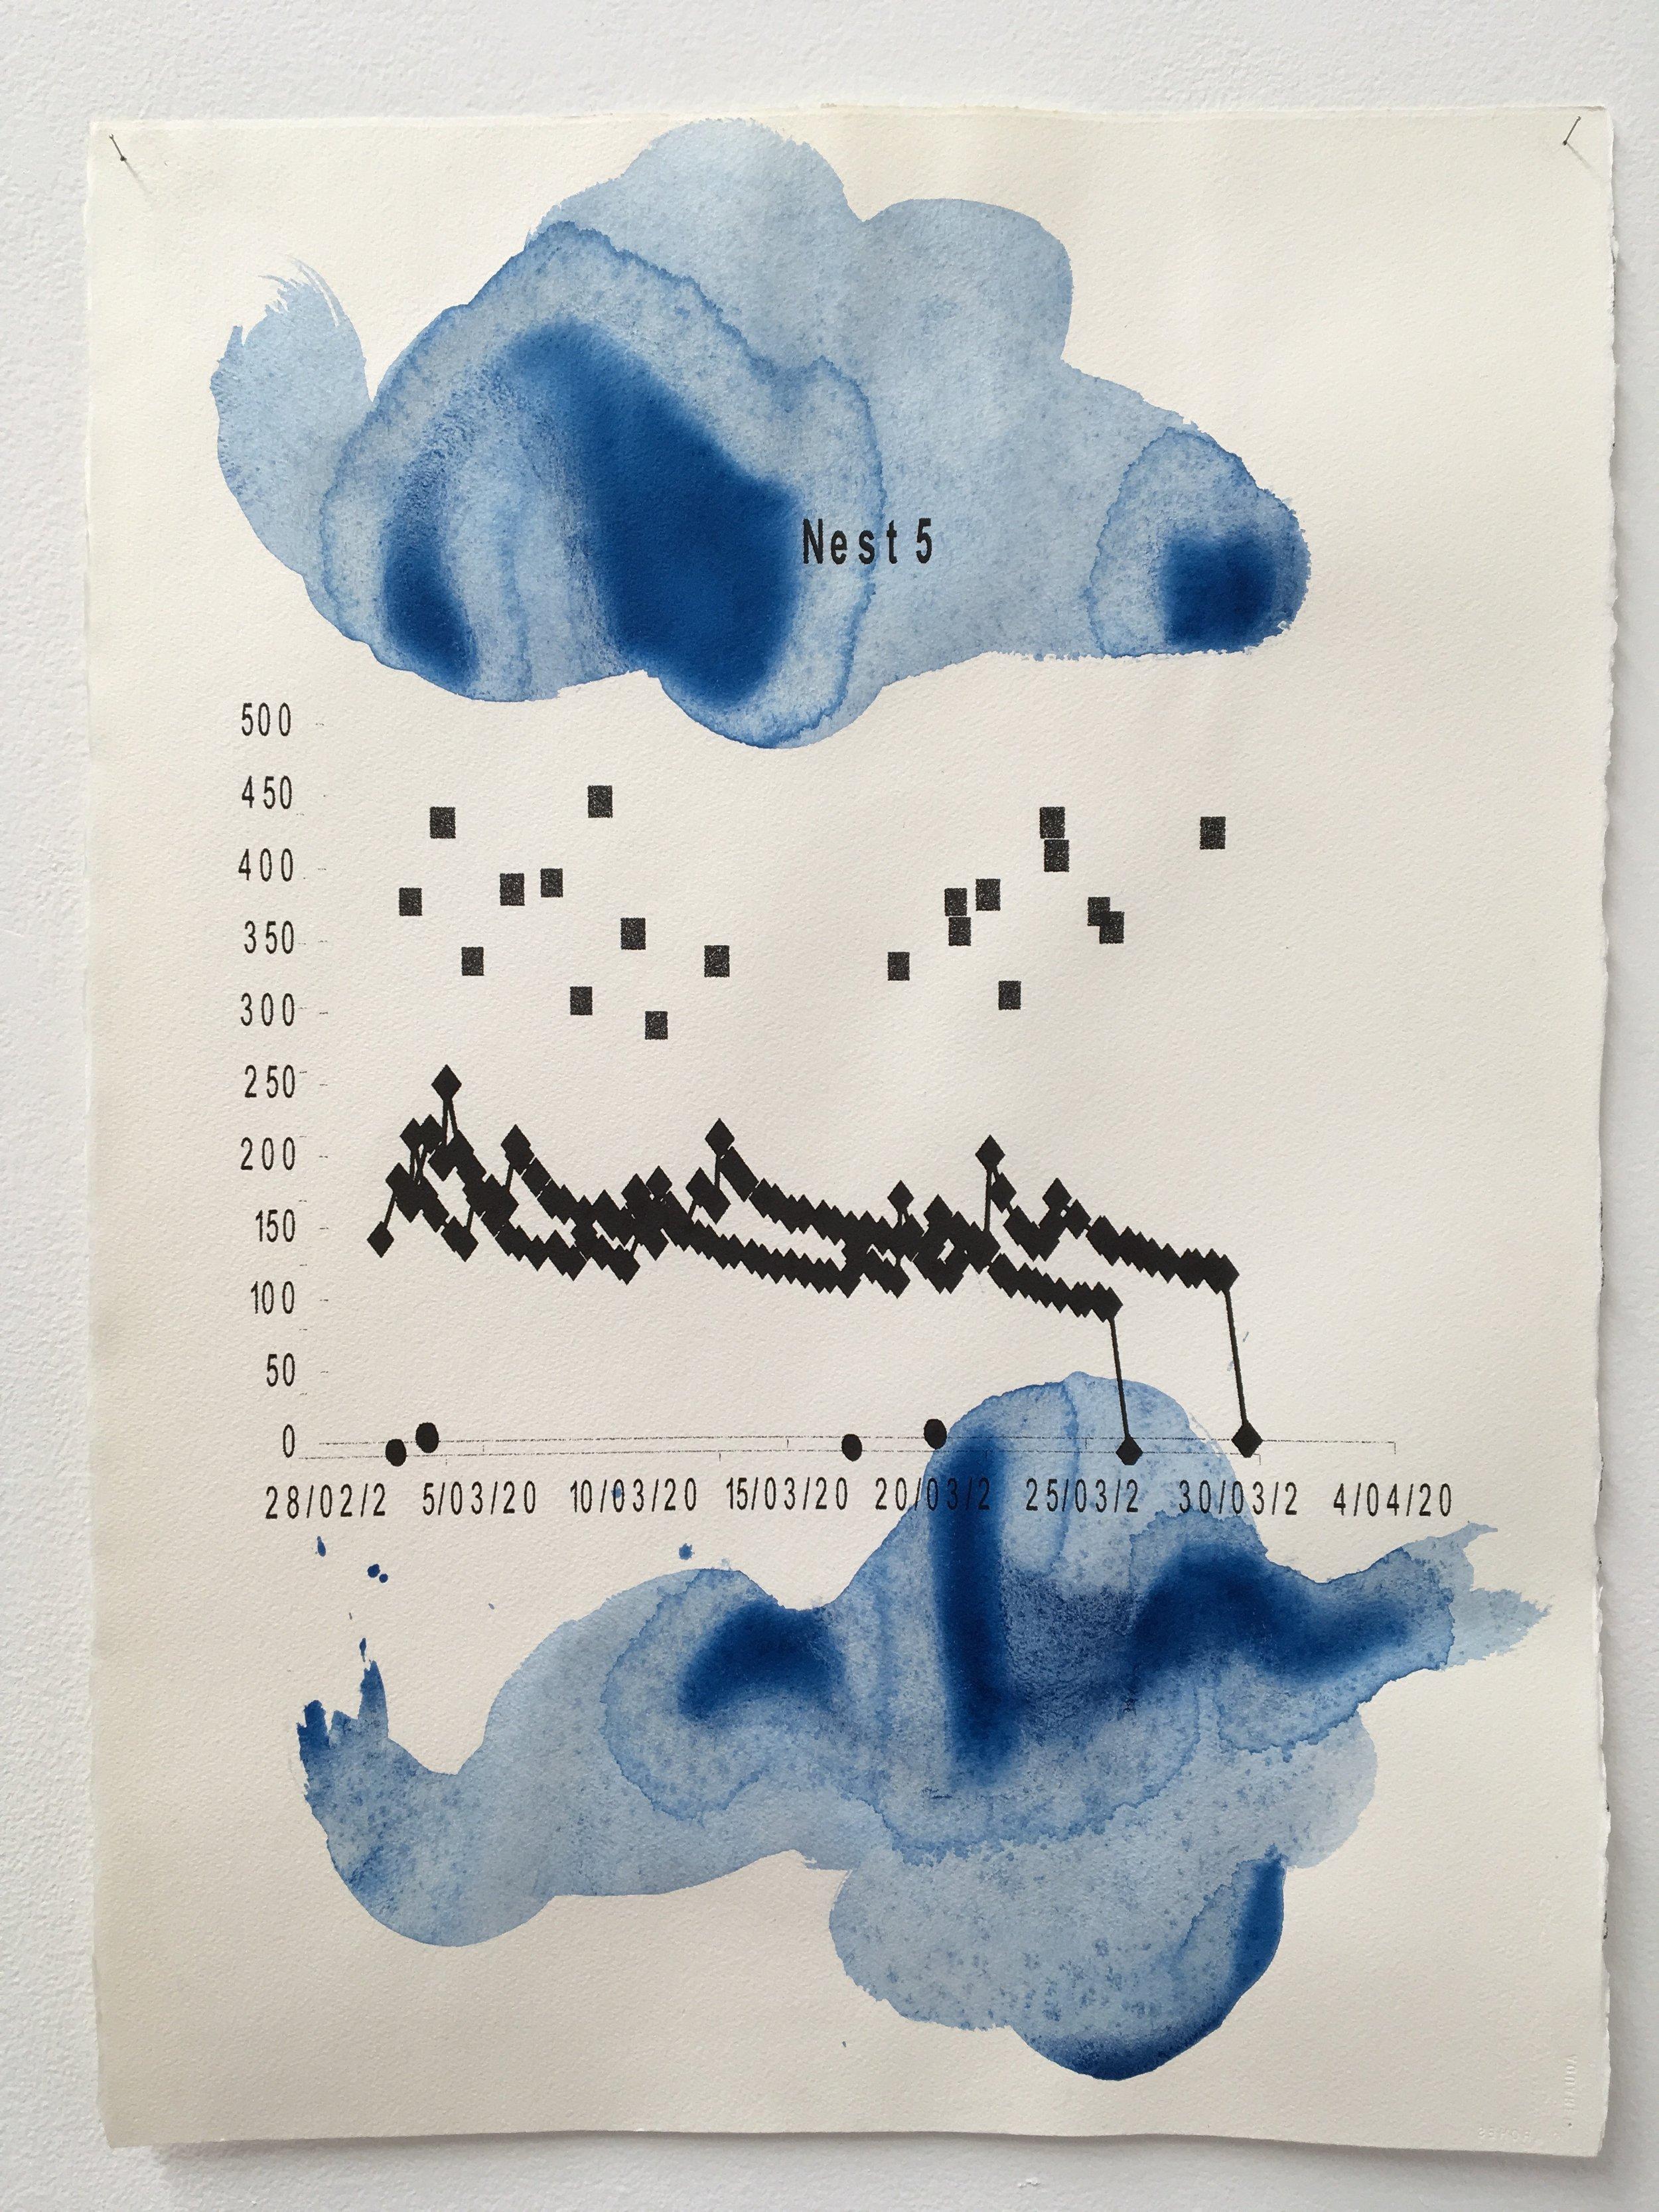 Judy Watson heron island 12 2009-16 acrylic and digital print on paper 77 x 57 cm.jpg